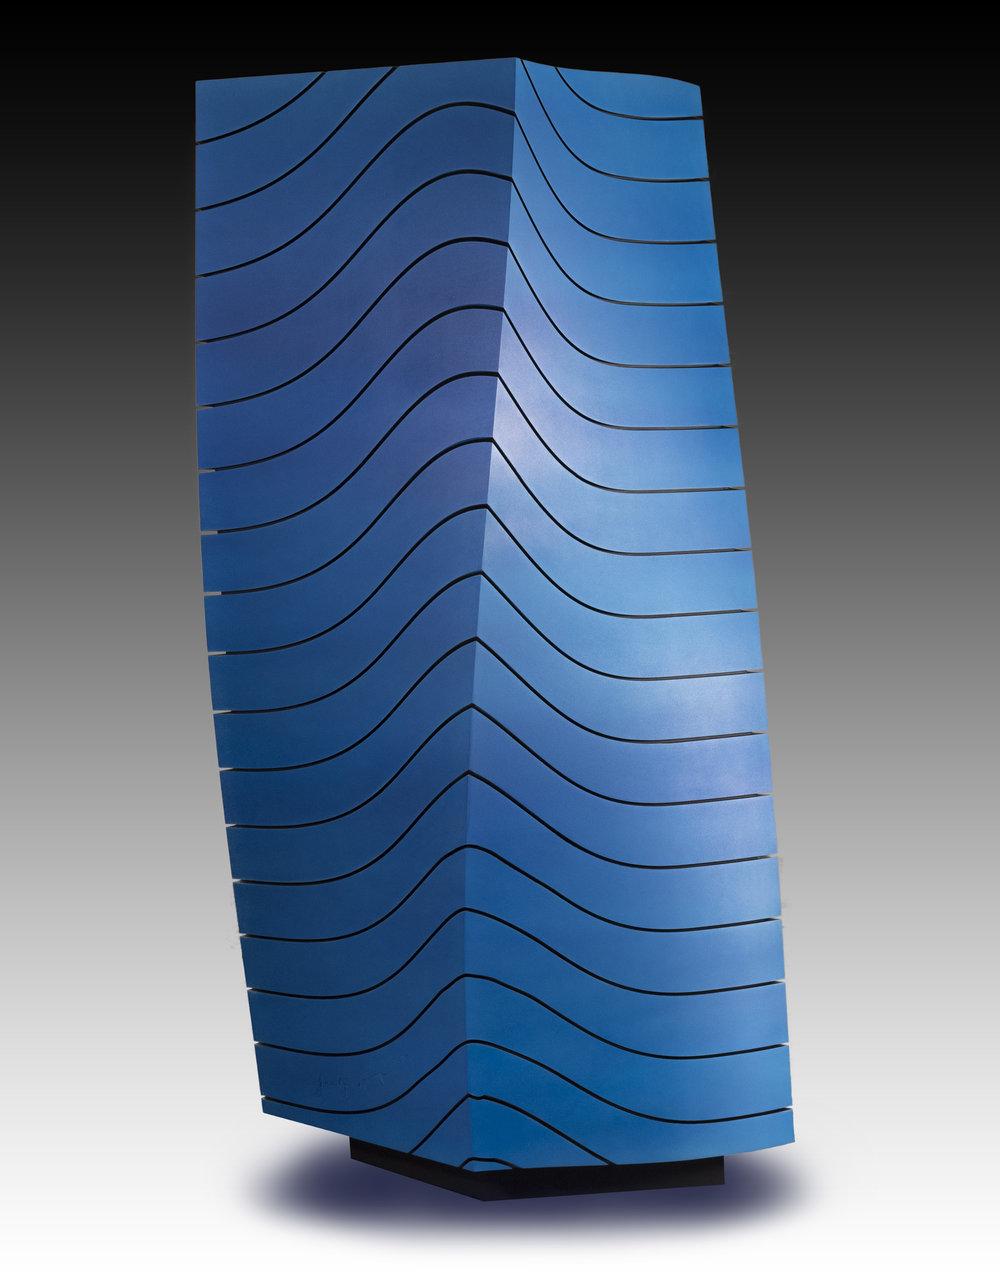 Blue Blade 01 © Jonathan Spring